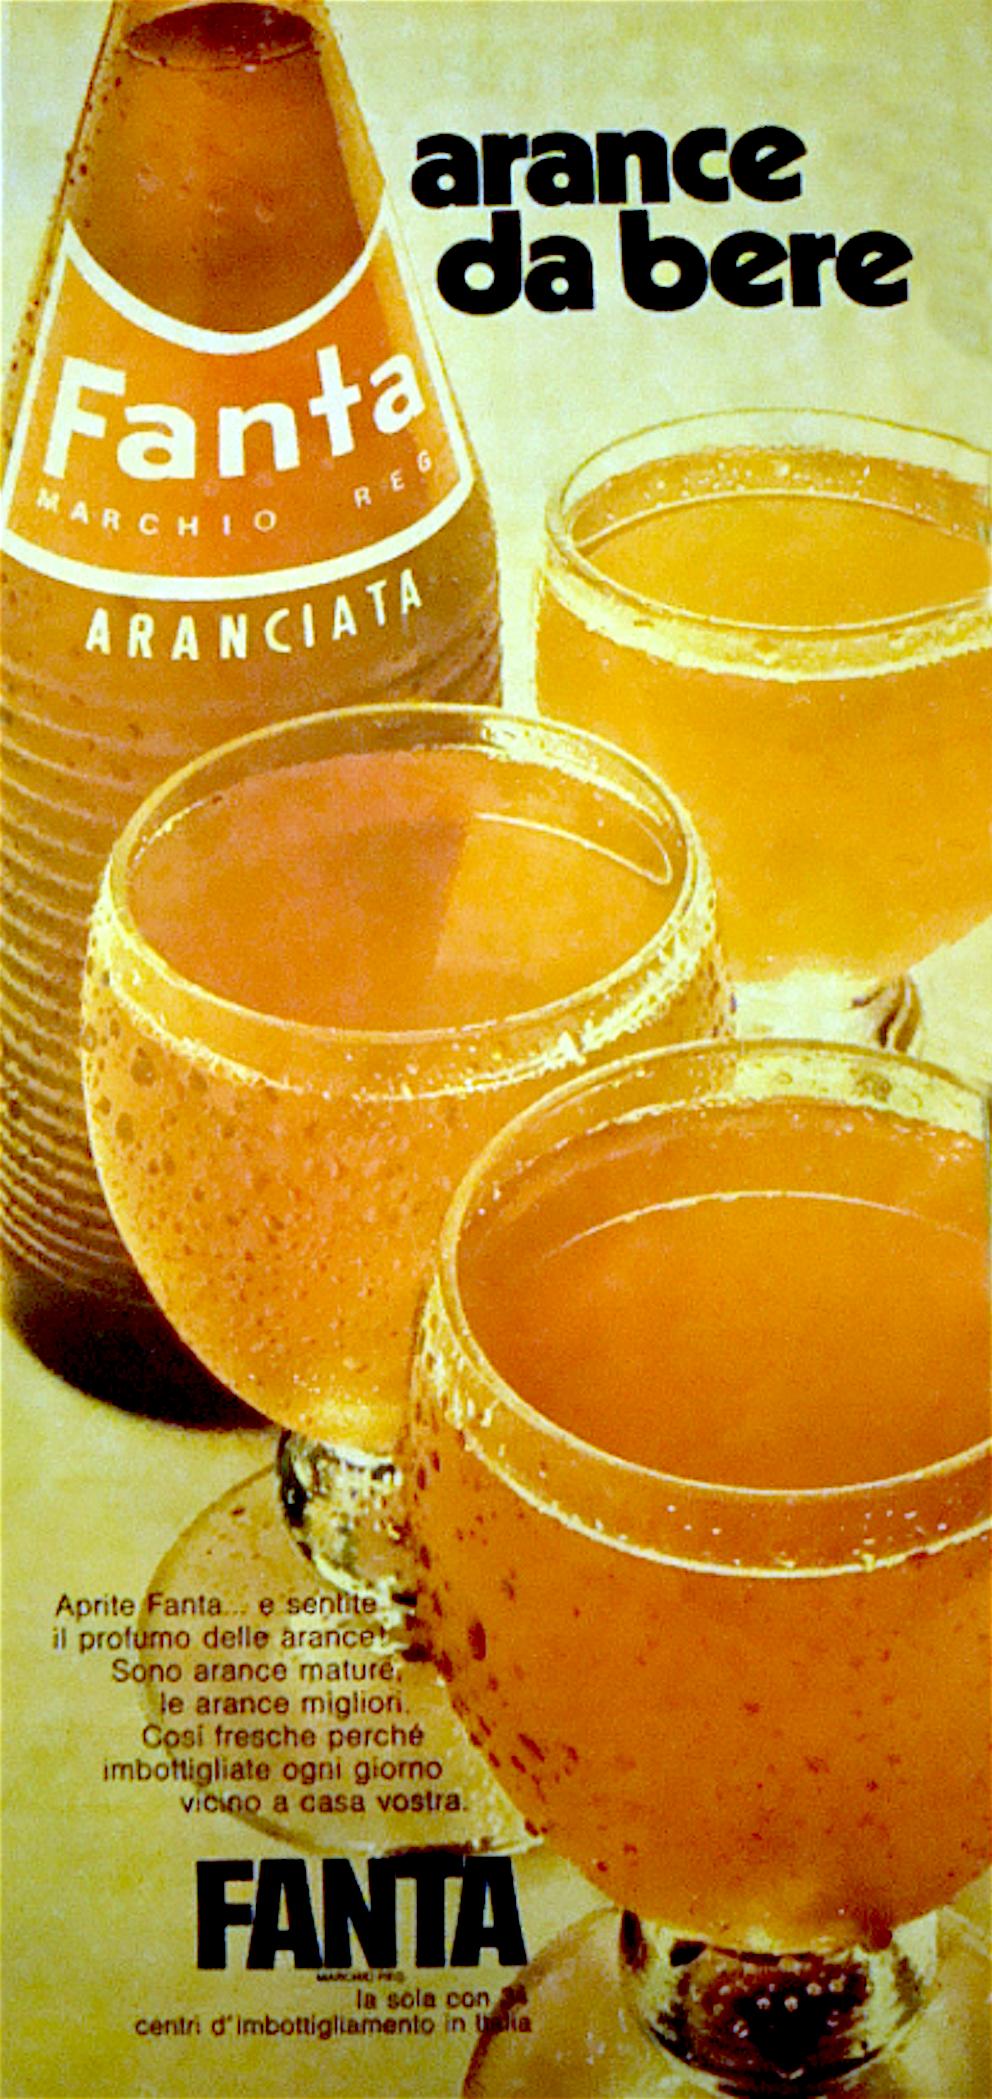 fanta_aranciata_pubblicitu_vintage_anni_70